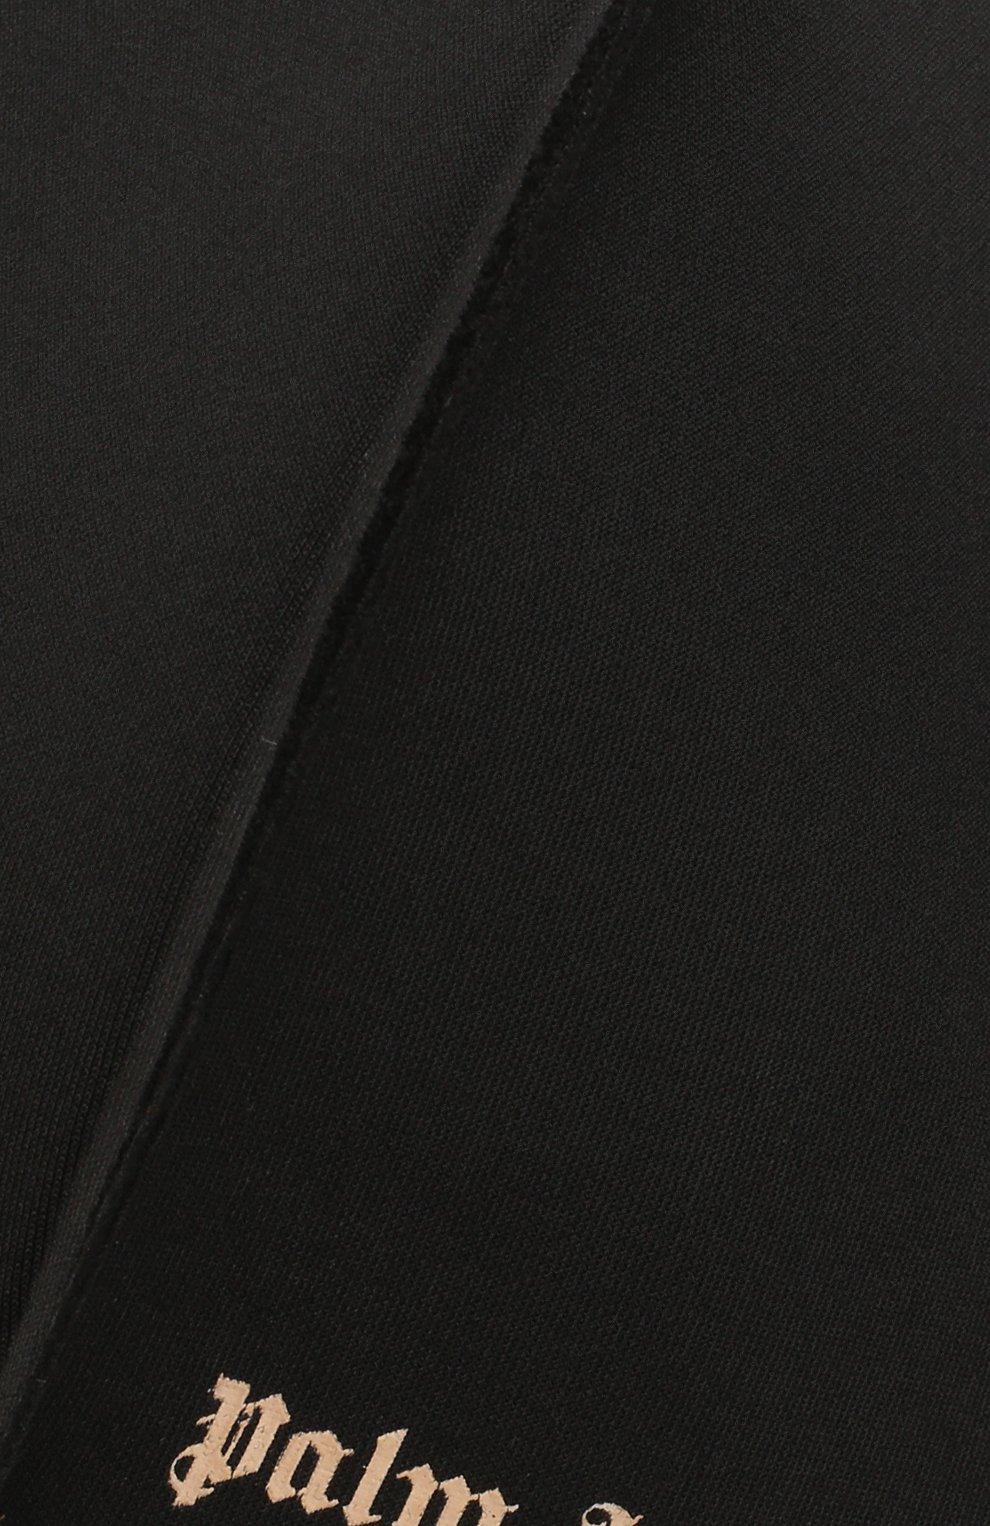 Мужская маска для лица PALM ANGELS черного цвета, арт. PMRG001E194800021001 | Фото 3